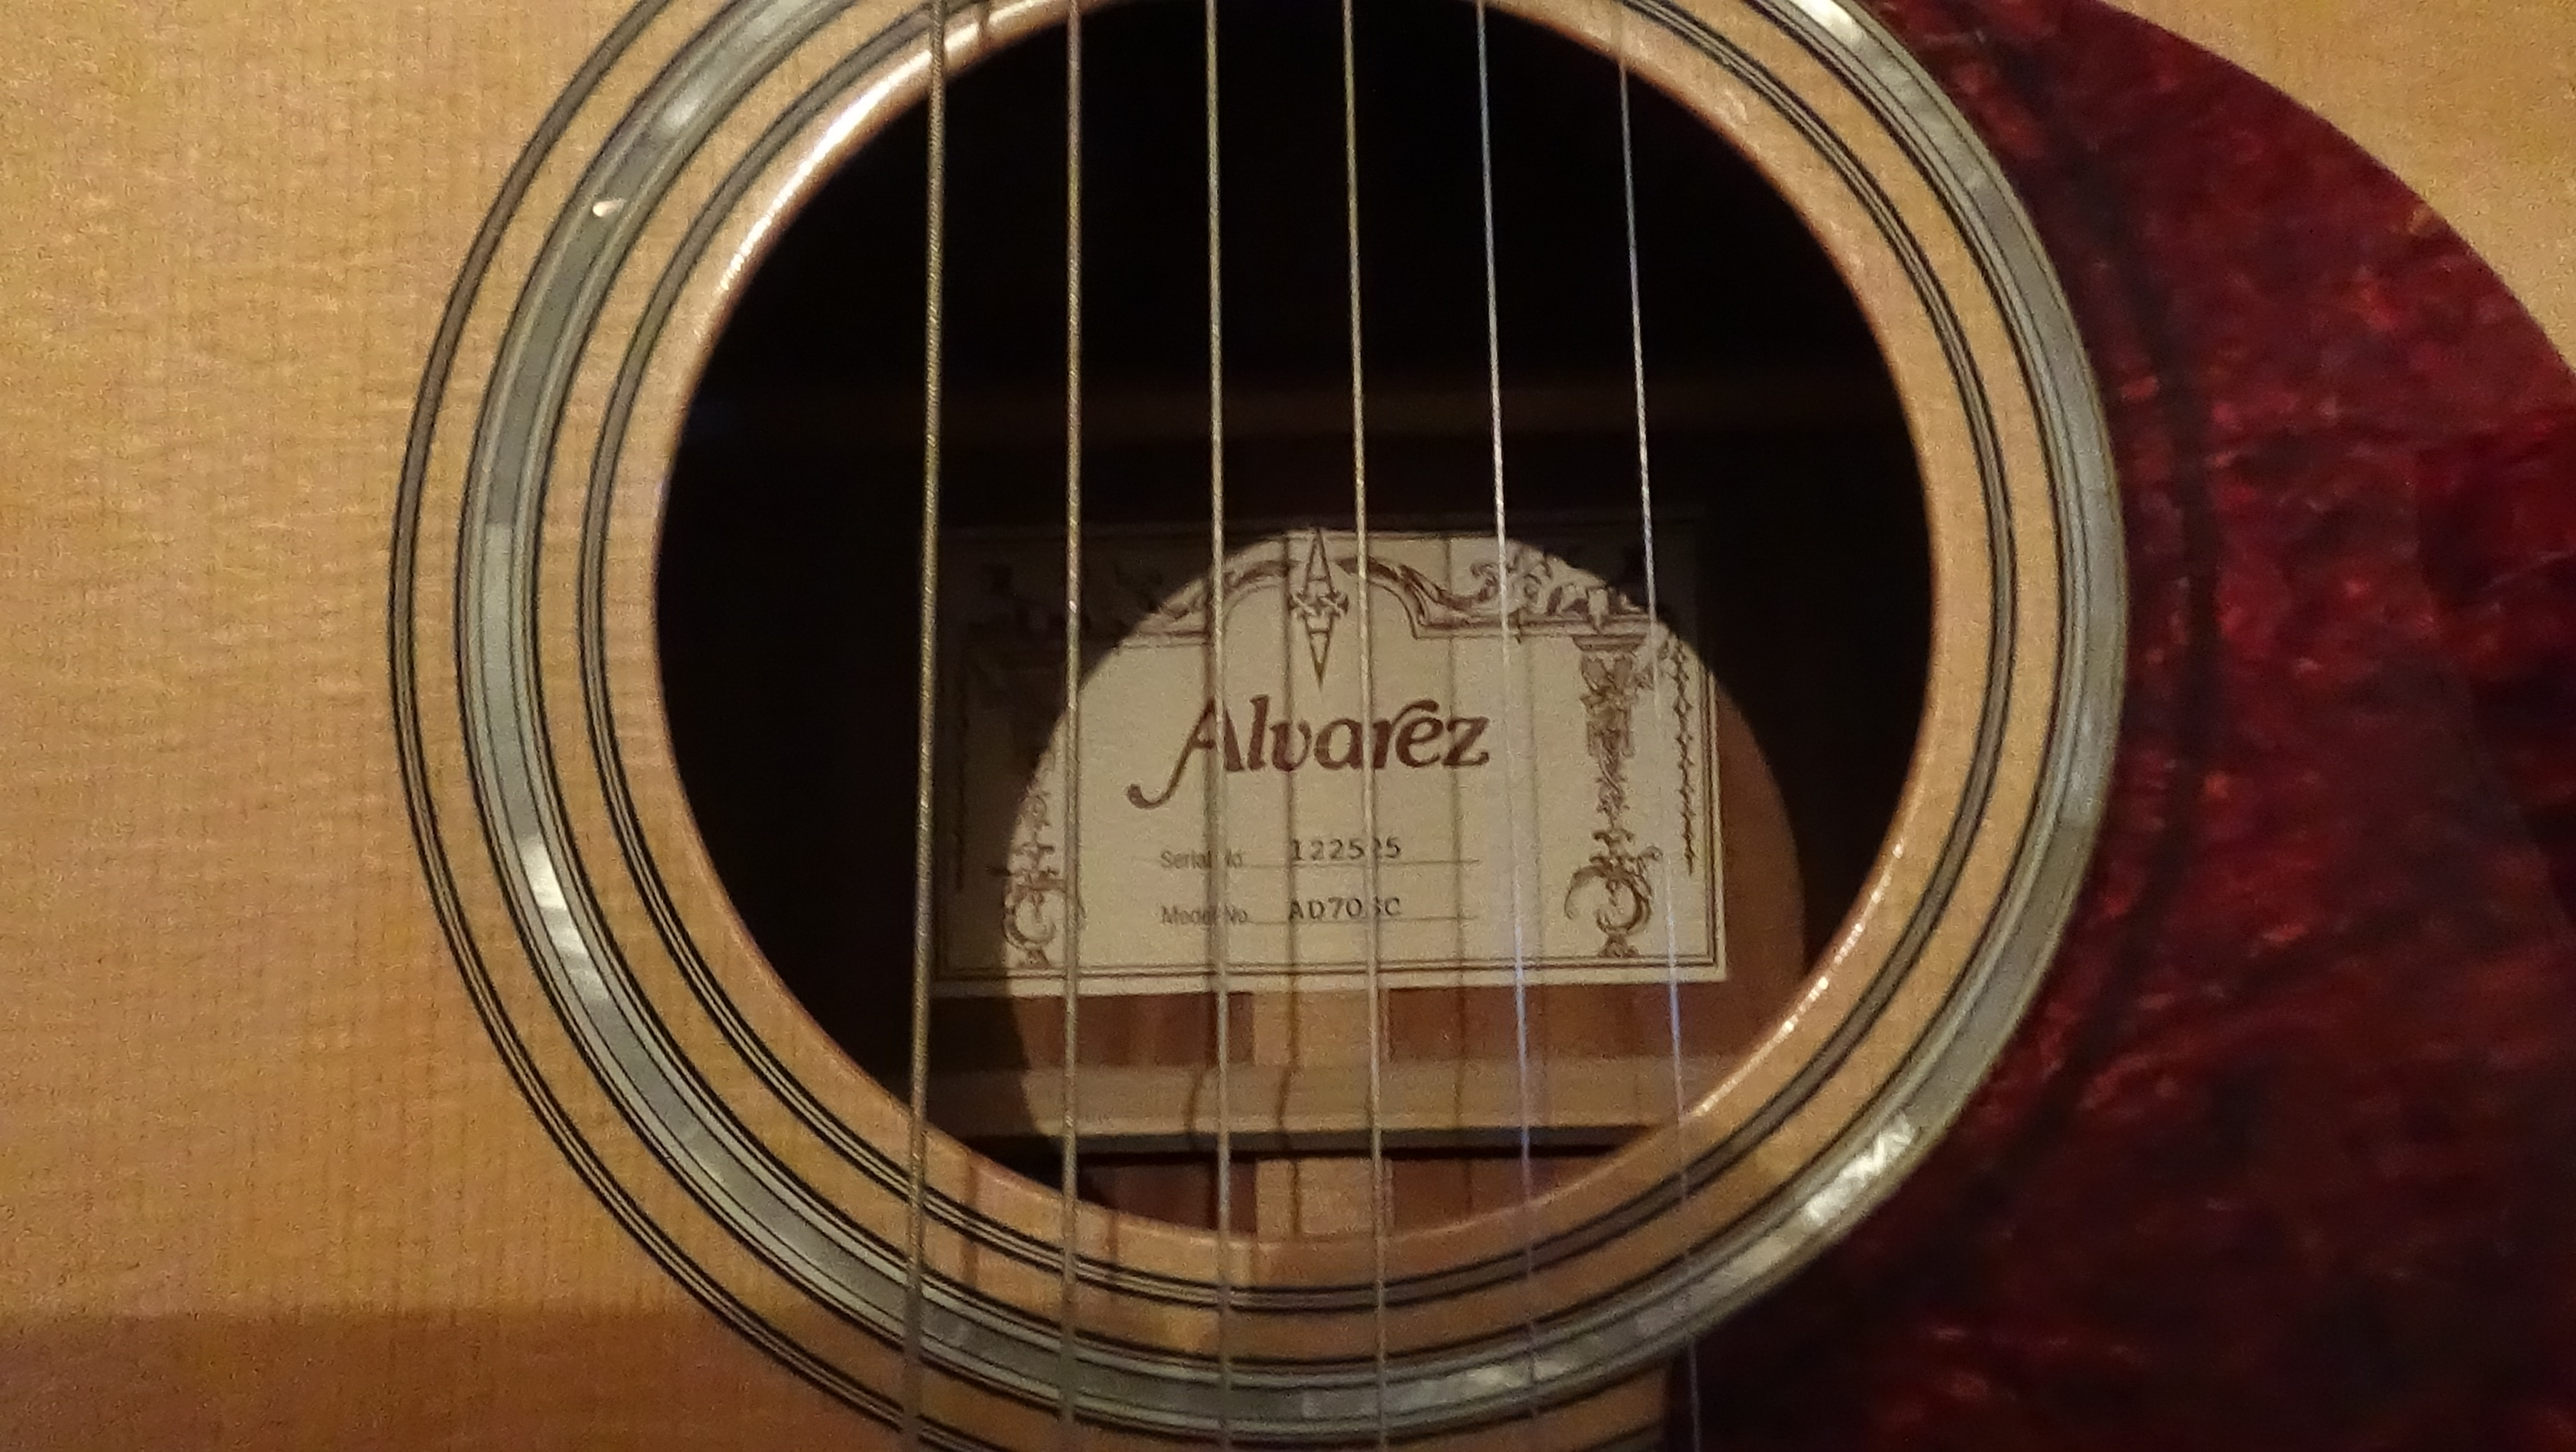 Alvarez Ad70Sc Acoustic Electric Guitar ad 70 s